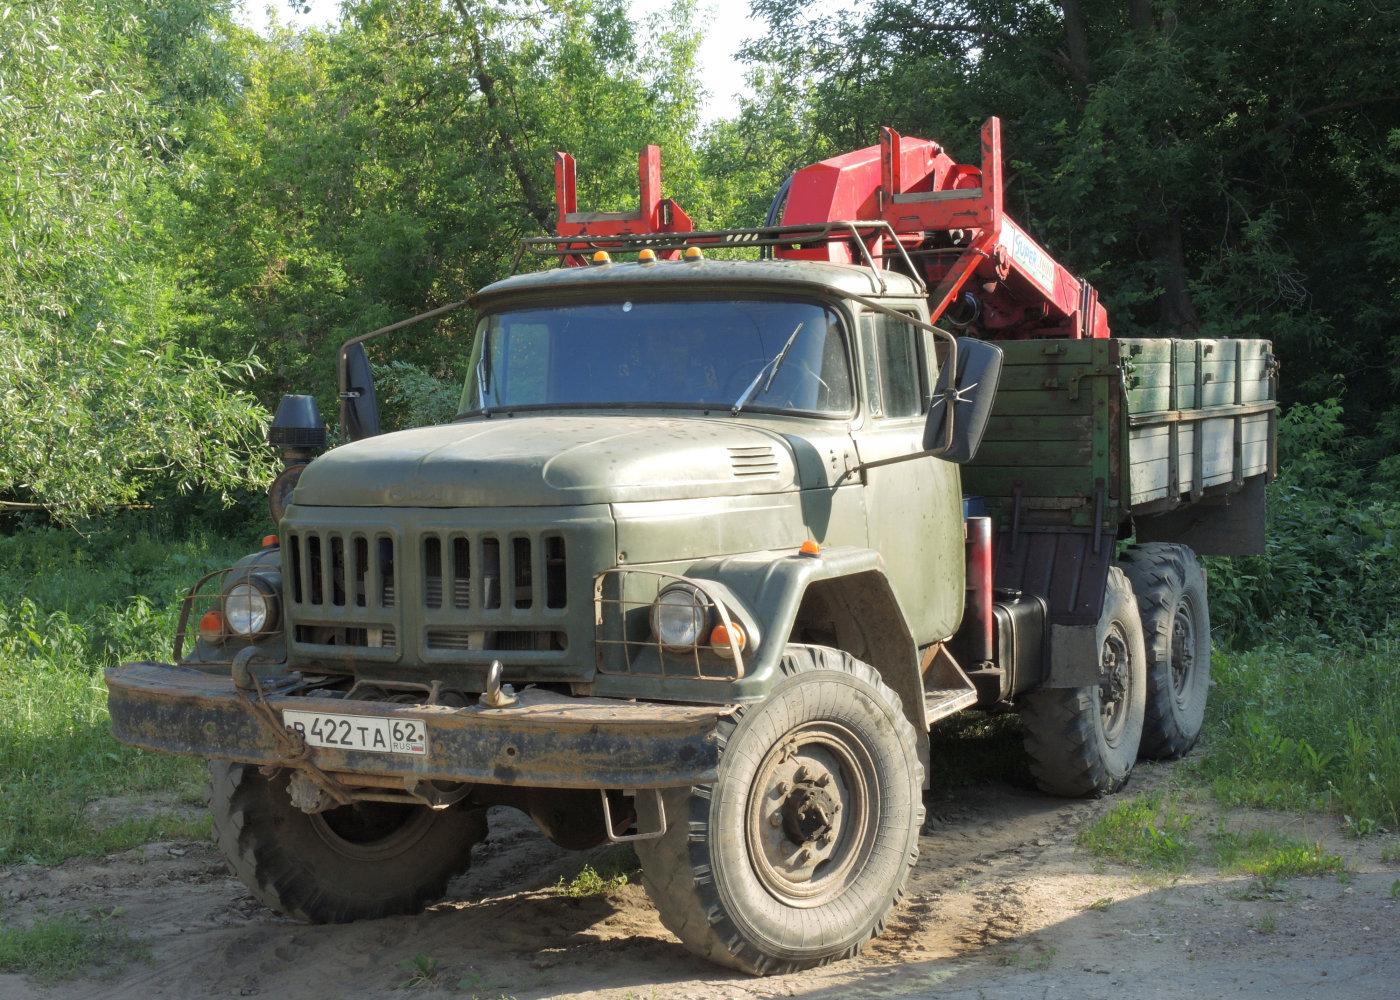 Грузовой автомобиль ЗиЛ-131НА # В 422 ТА 62. г. Рязань, Затинная ул.